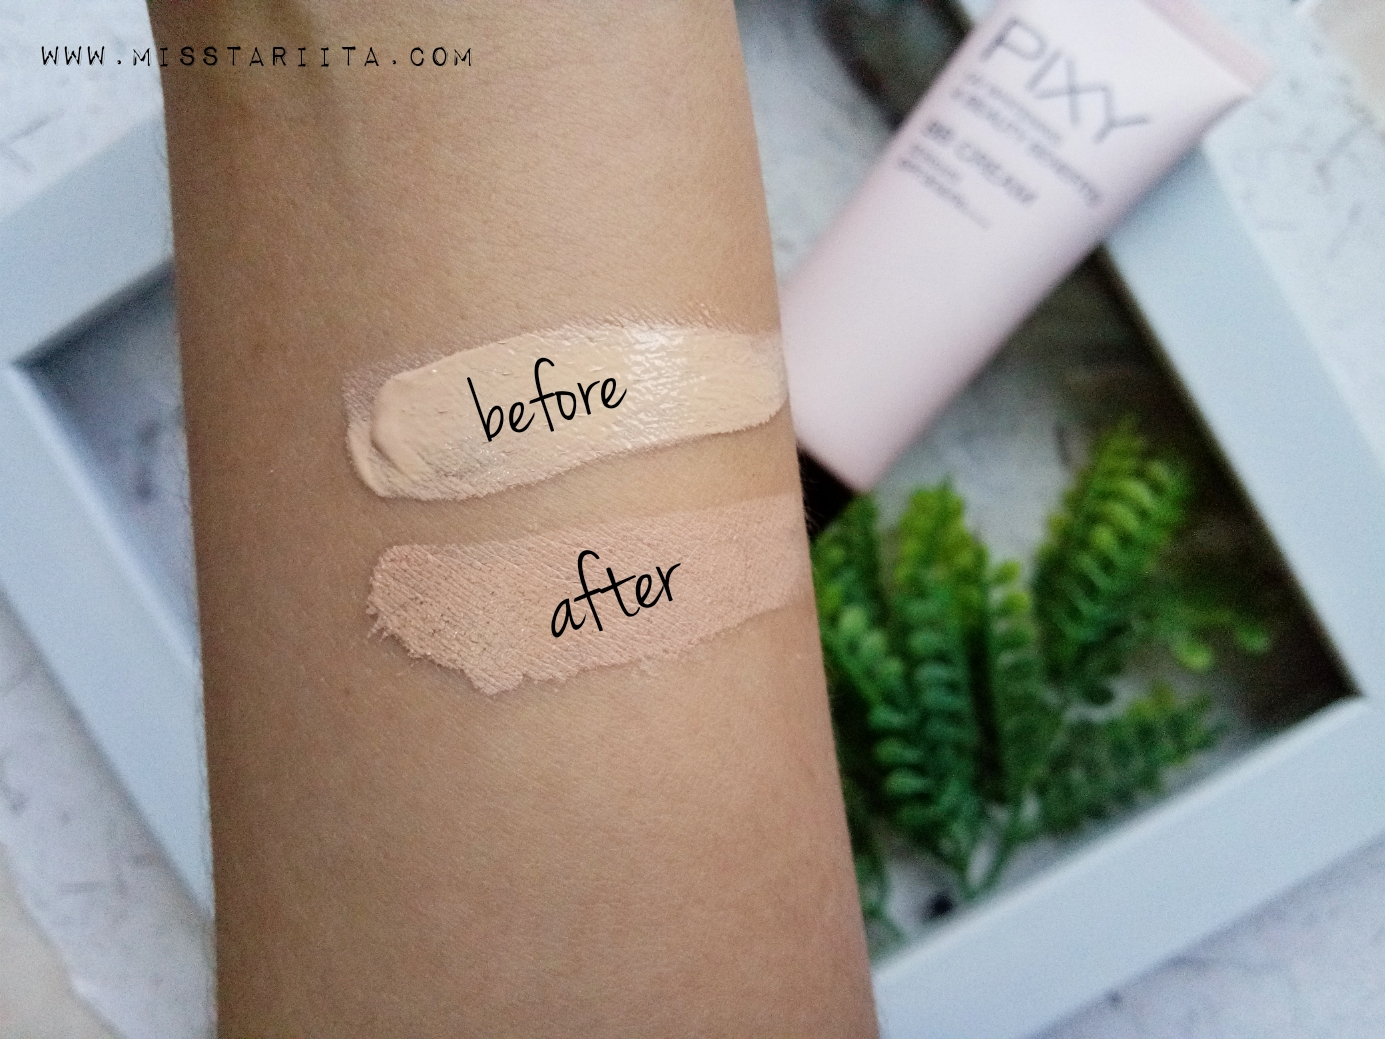 Review Pixy Bb Cream Uv Whitening 4 Beauty Benefits Spf 30 Shade Tetapi Ada Hal Lain Yang Kurang Aku Suka Dari Ini Setelah Selang Beberapa Jam Wajah Jadi Kelihatan Berpori Atau Pori Lebih Jelas